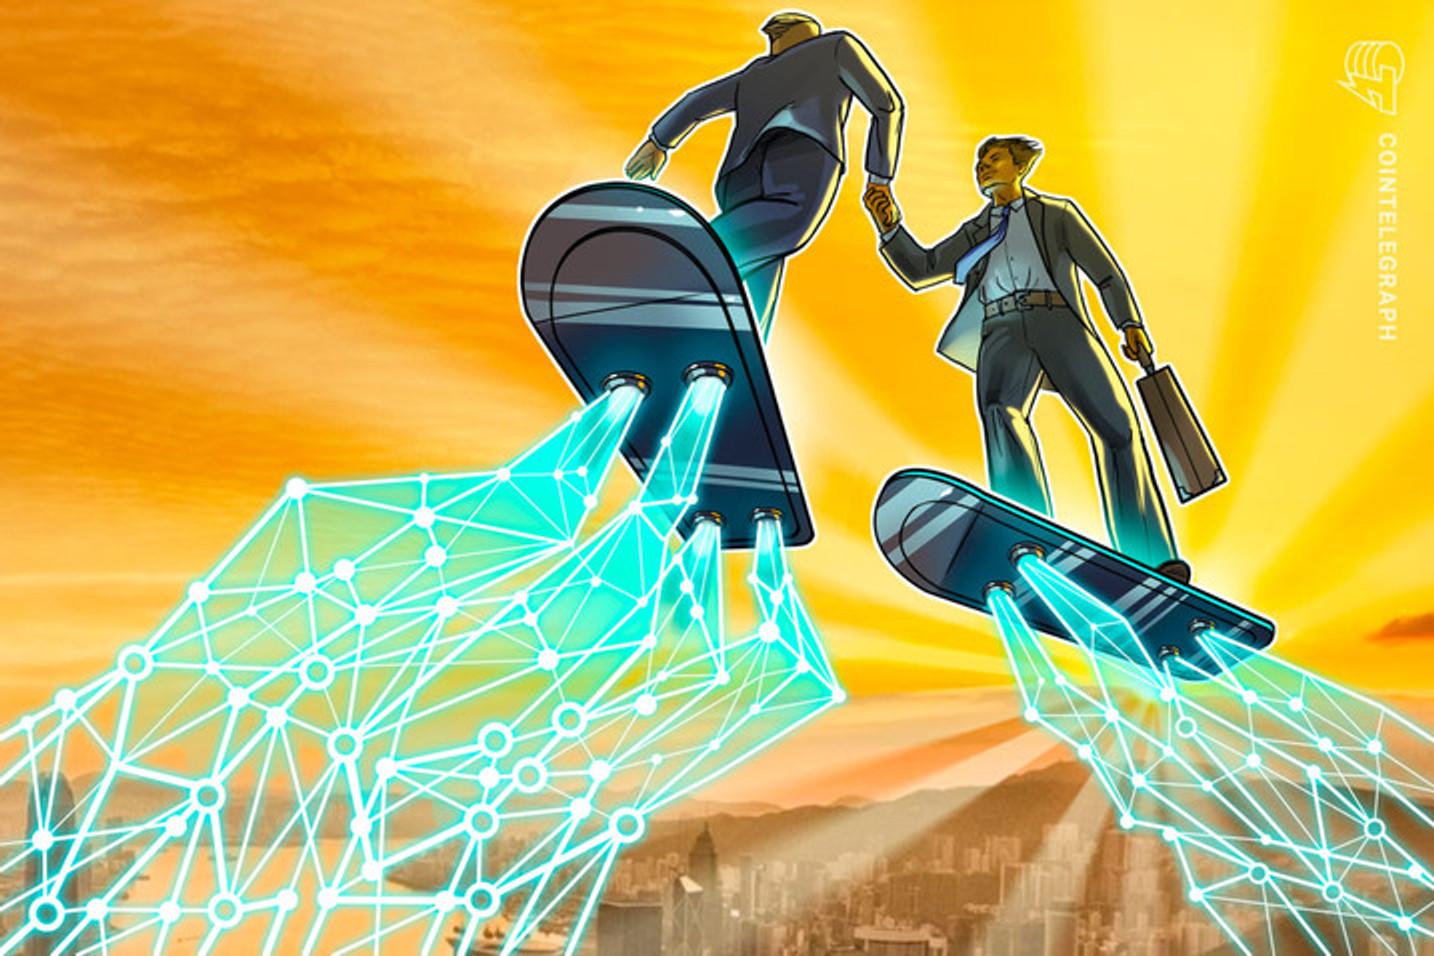 IOTA und Horizen bringen IOTA-Oracles auf andere Blockchains